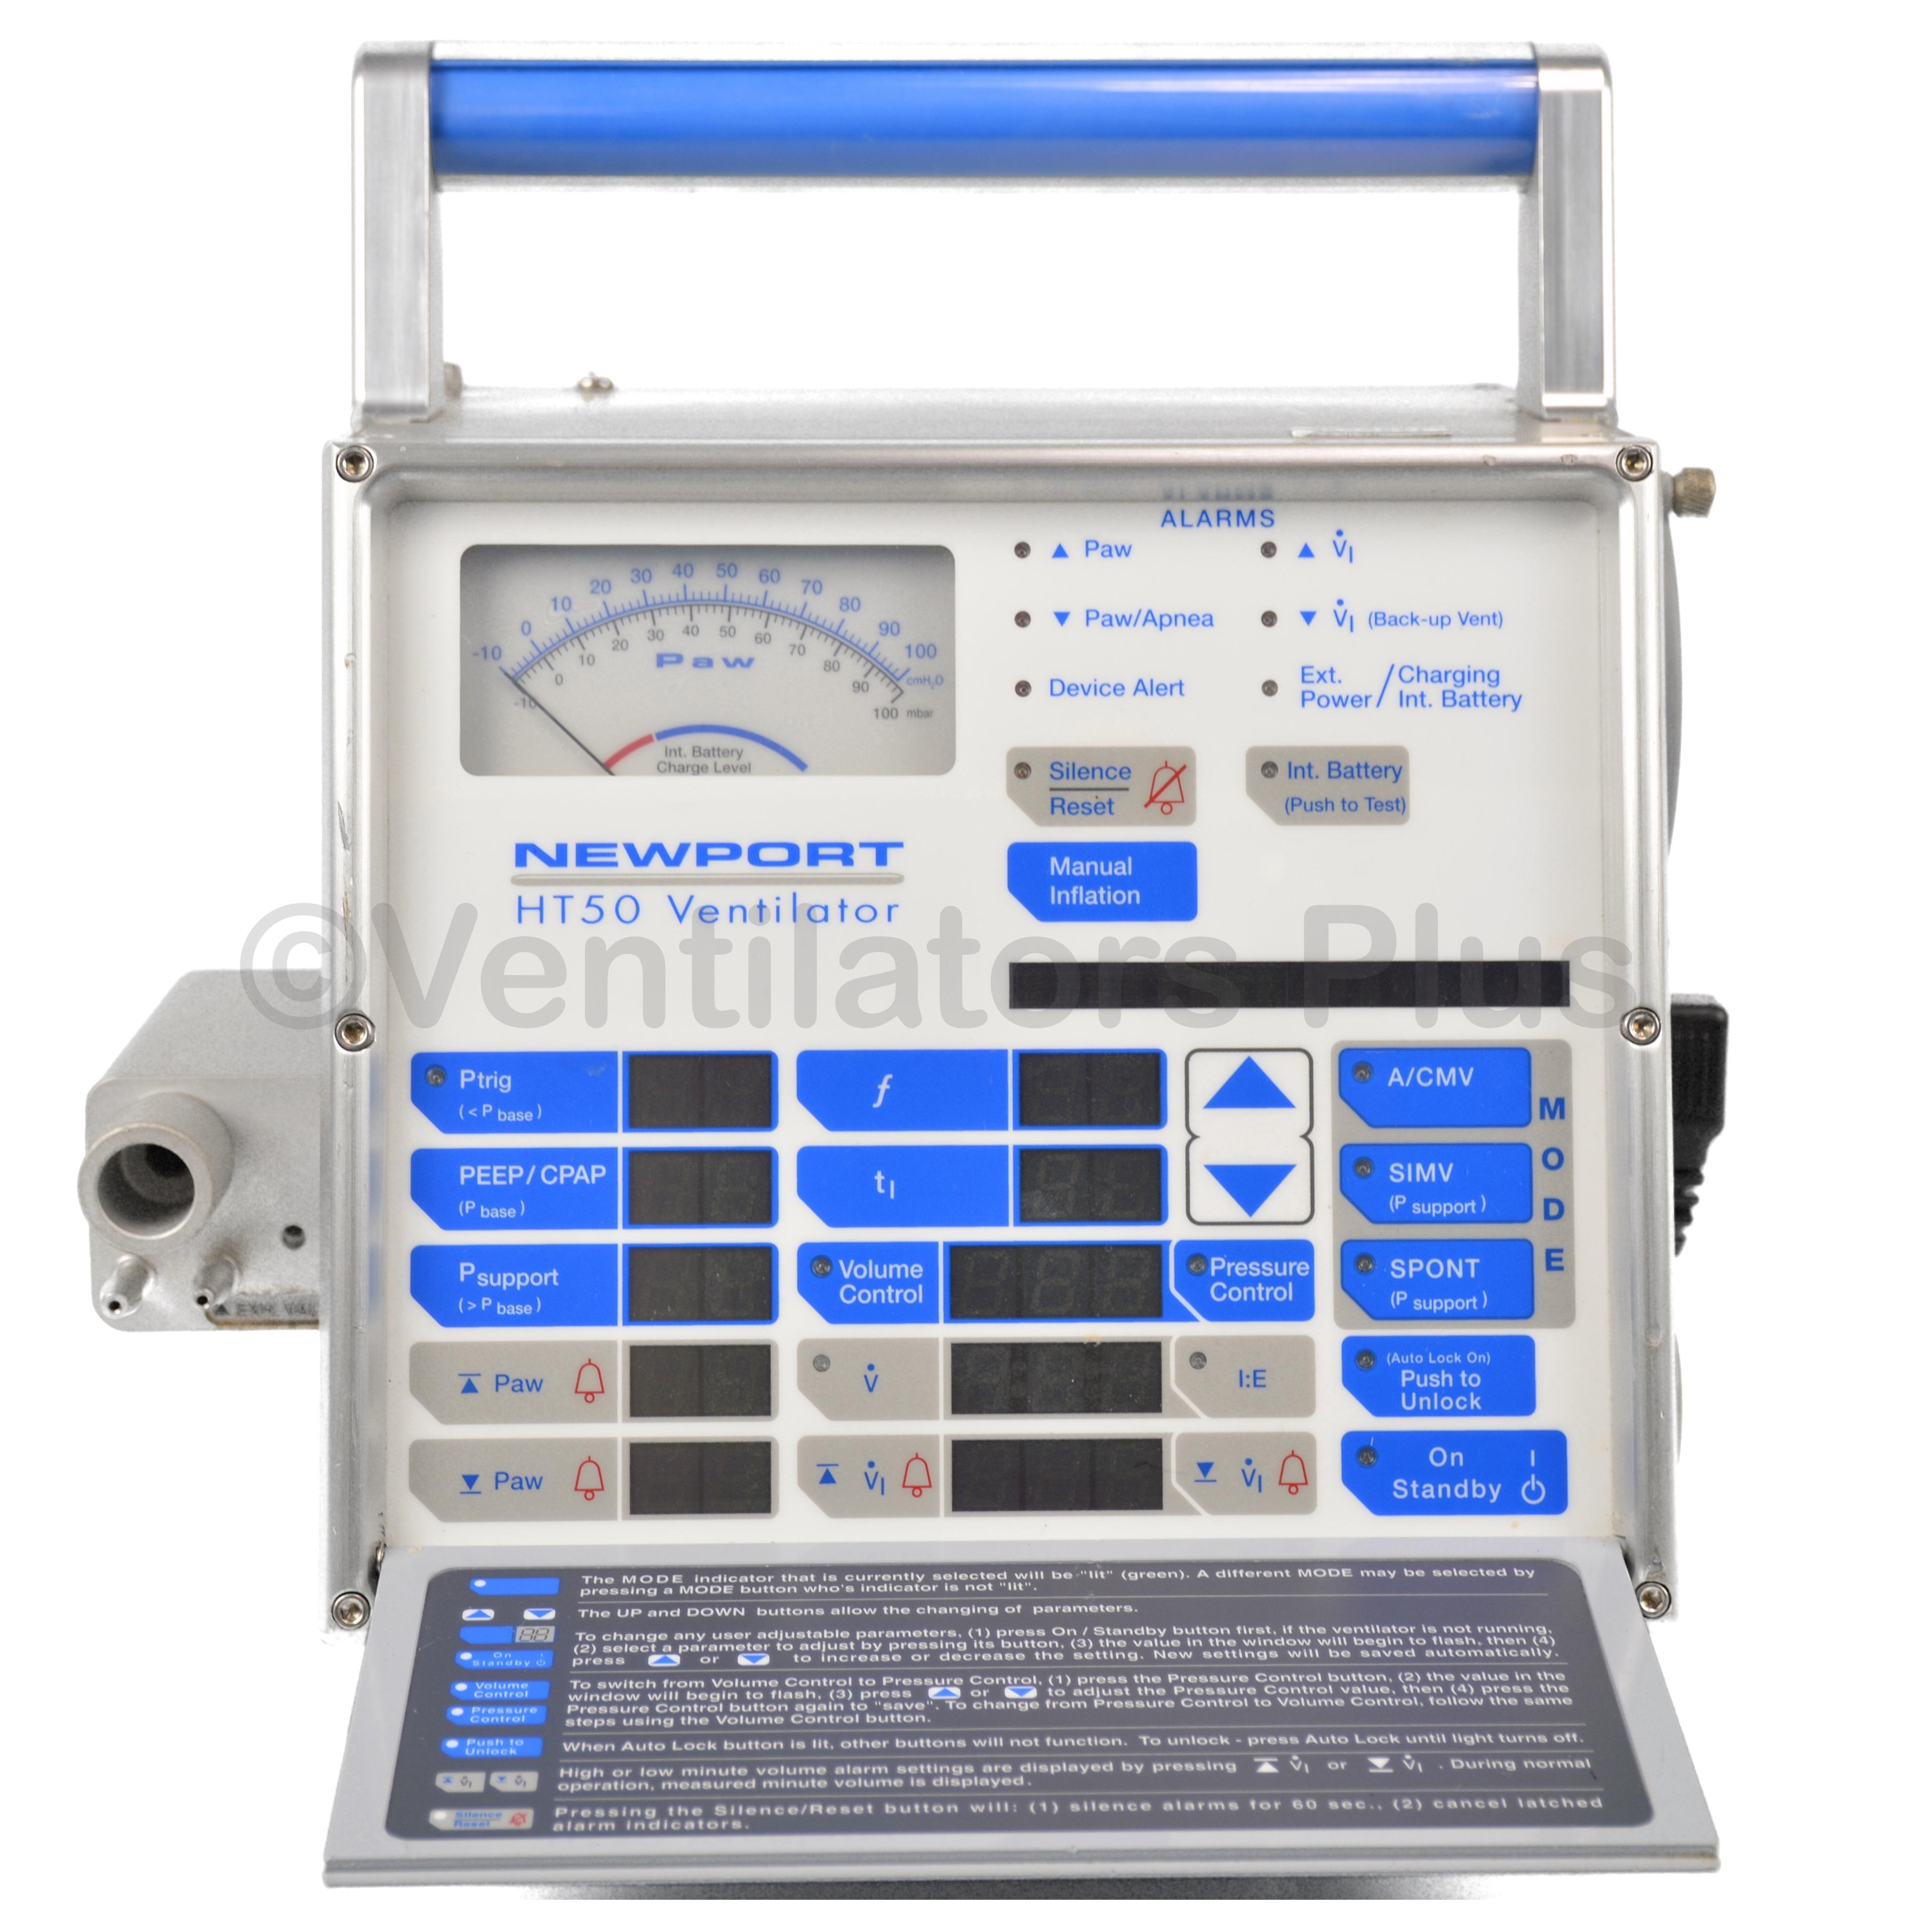 Newport ventilator